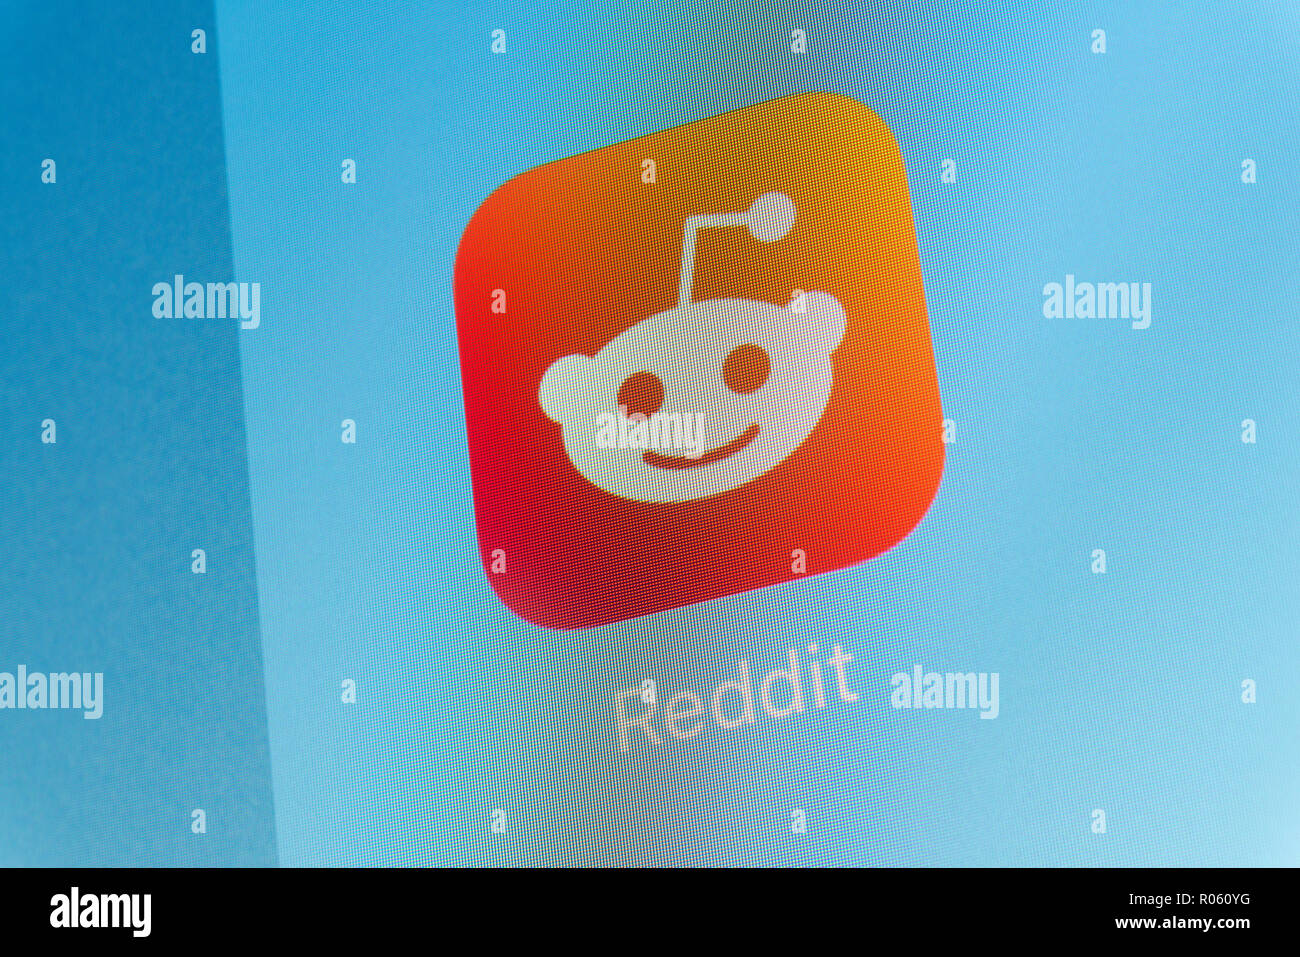 Reddit Stock Photos & Reddit Stock Images - Alamy